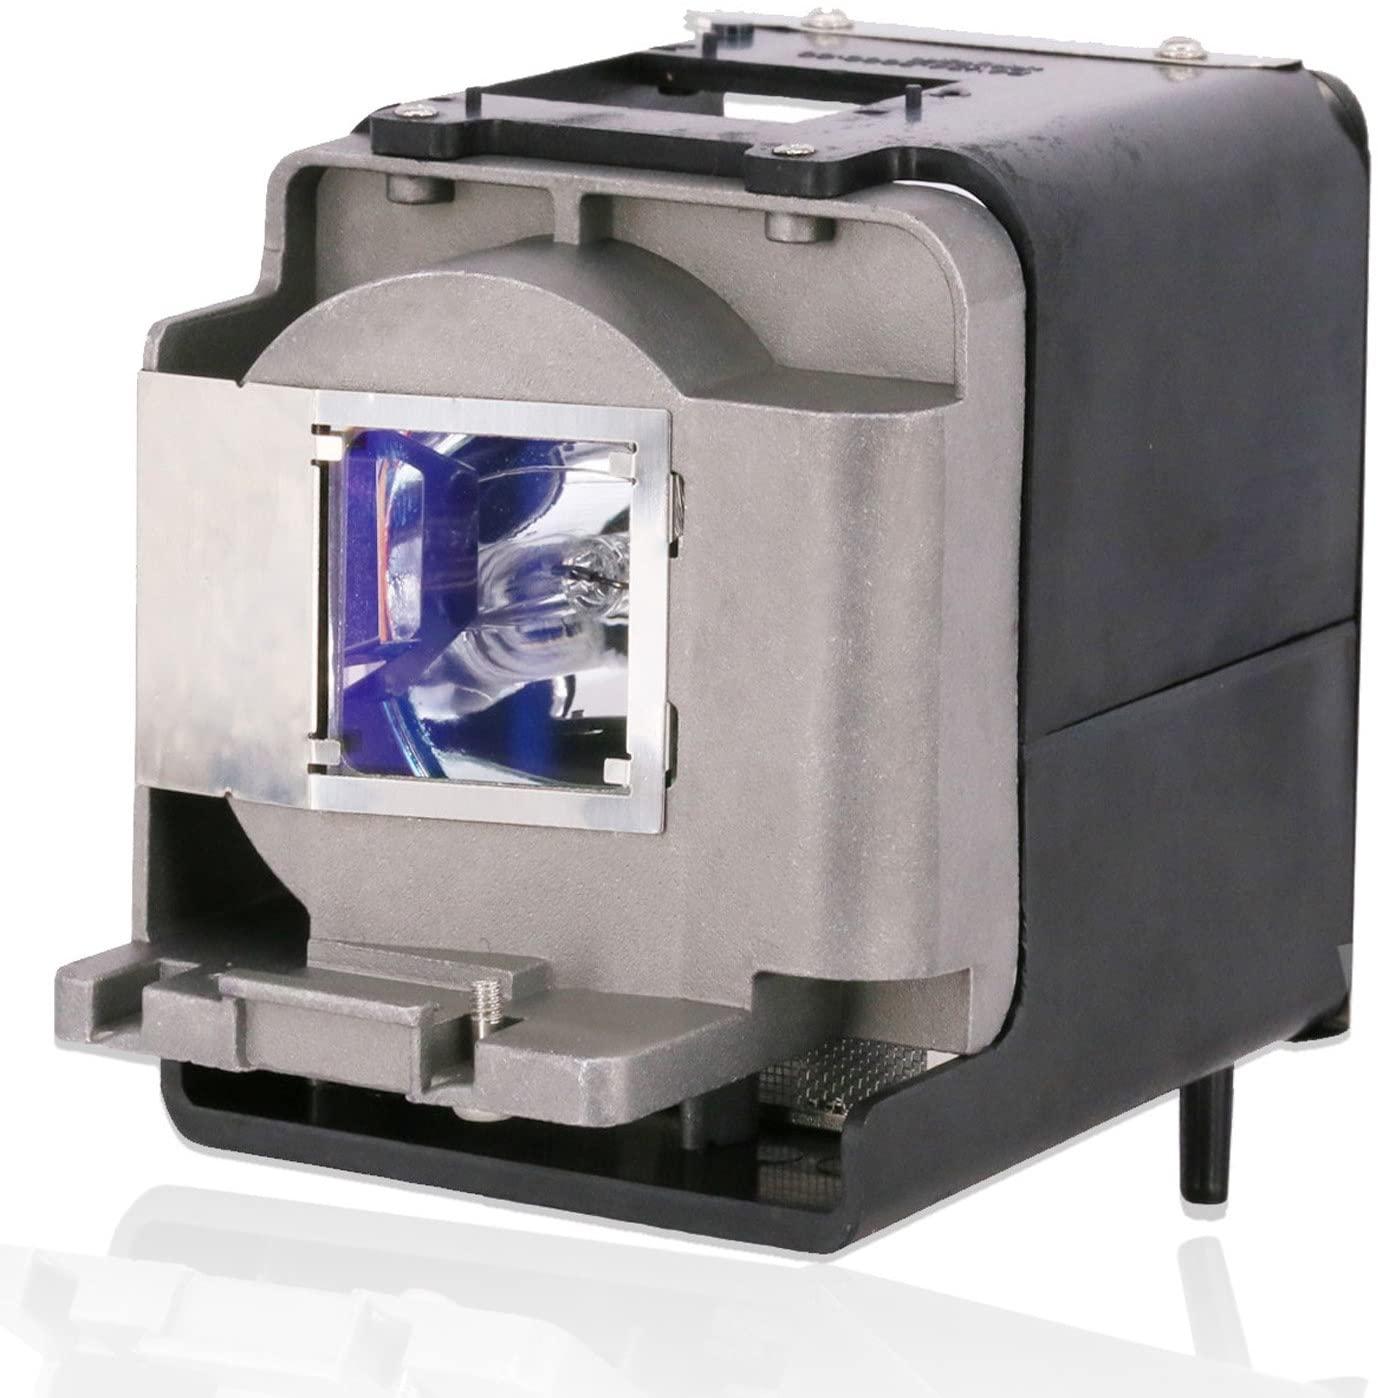 EWO'S RLC-061 Lamp Bulb for Viewsonic RLC-061 Pro8200 Pro8300 Pro8450W Pro8500 Pro8400 Projector Lamp Bulb Replacement